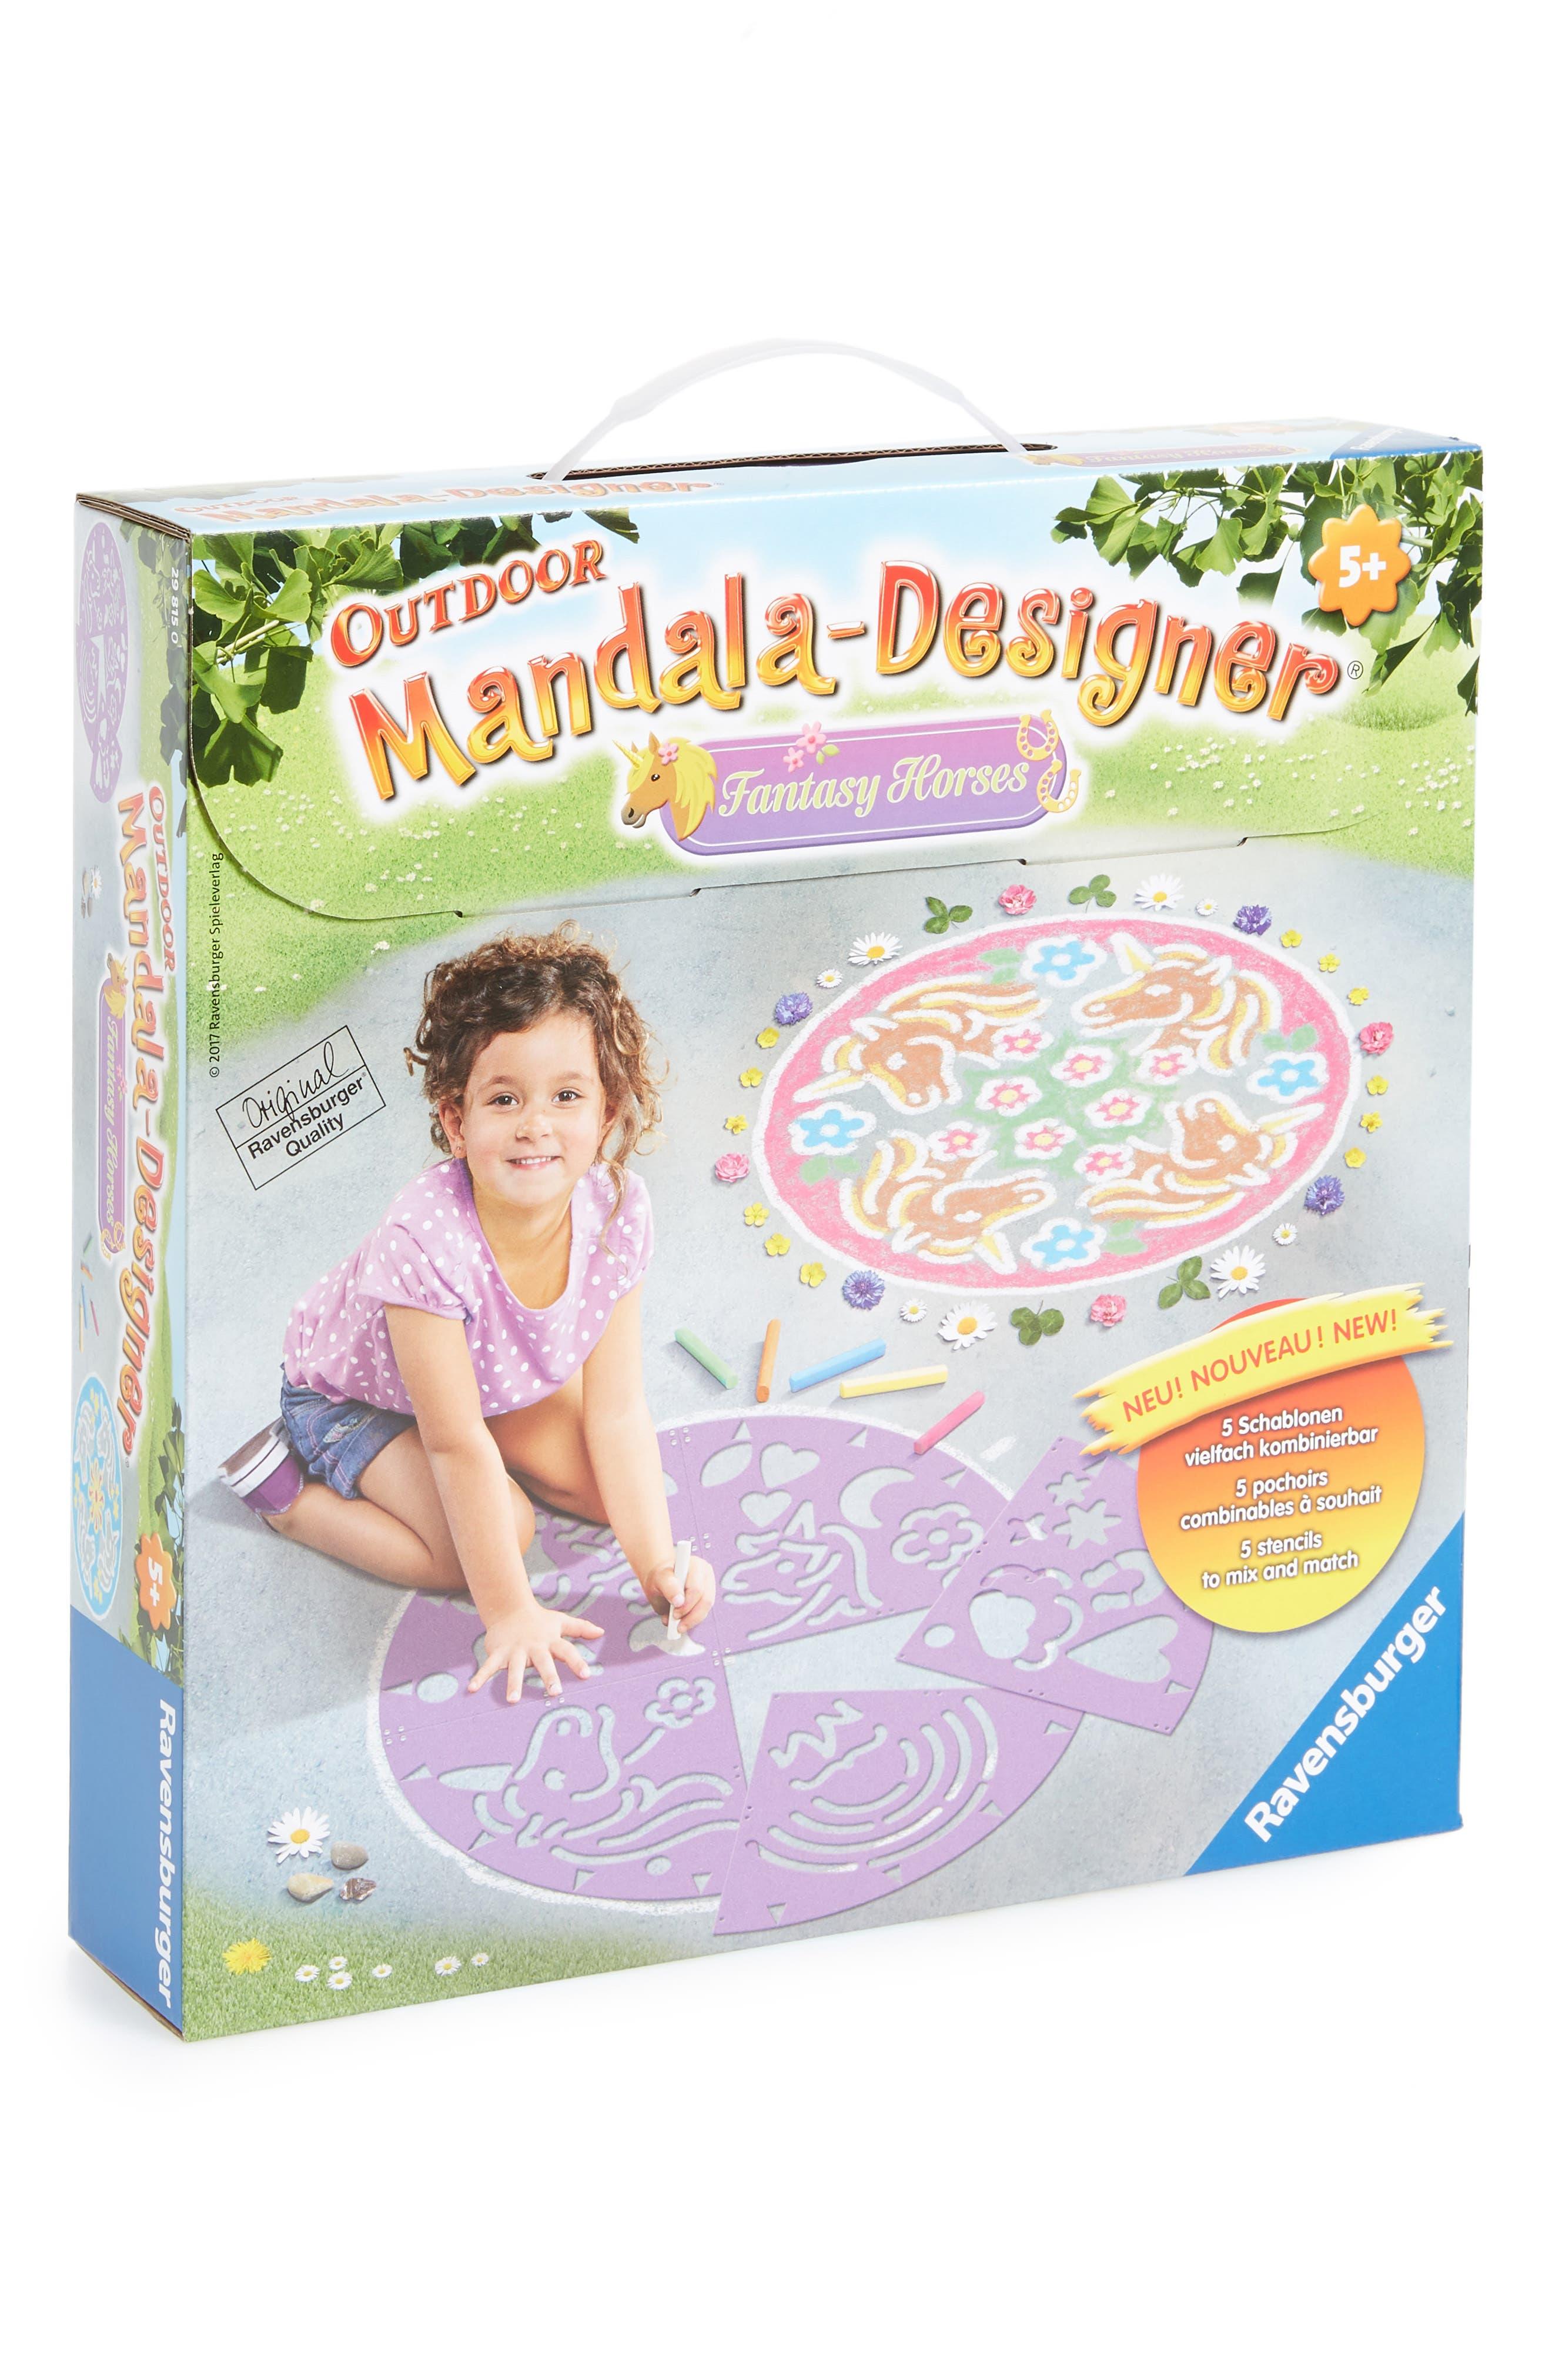 Outdoor Mandala Designer Fantasy Horses Chalk Kit,                         Main,                         color, 500